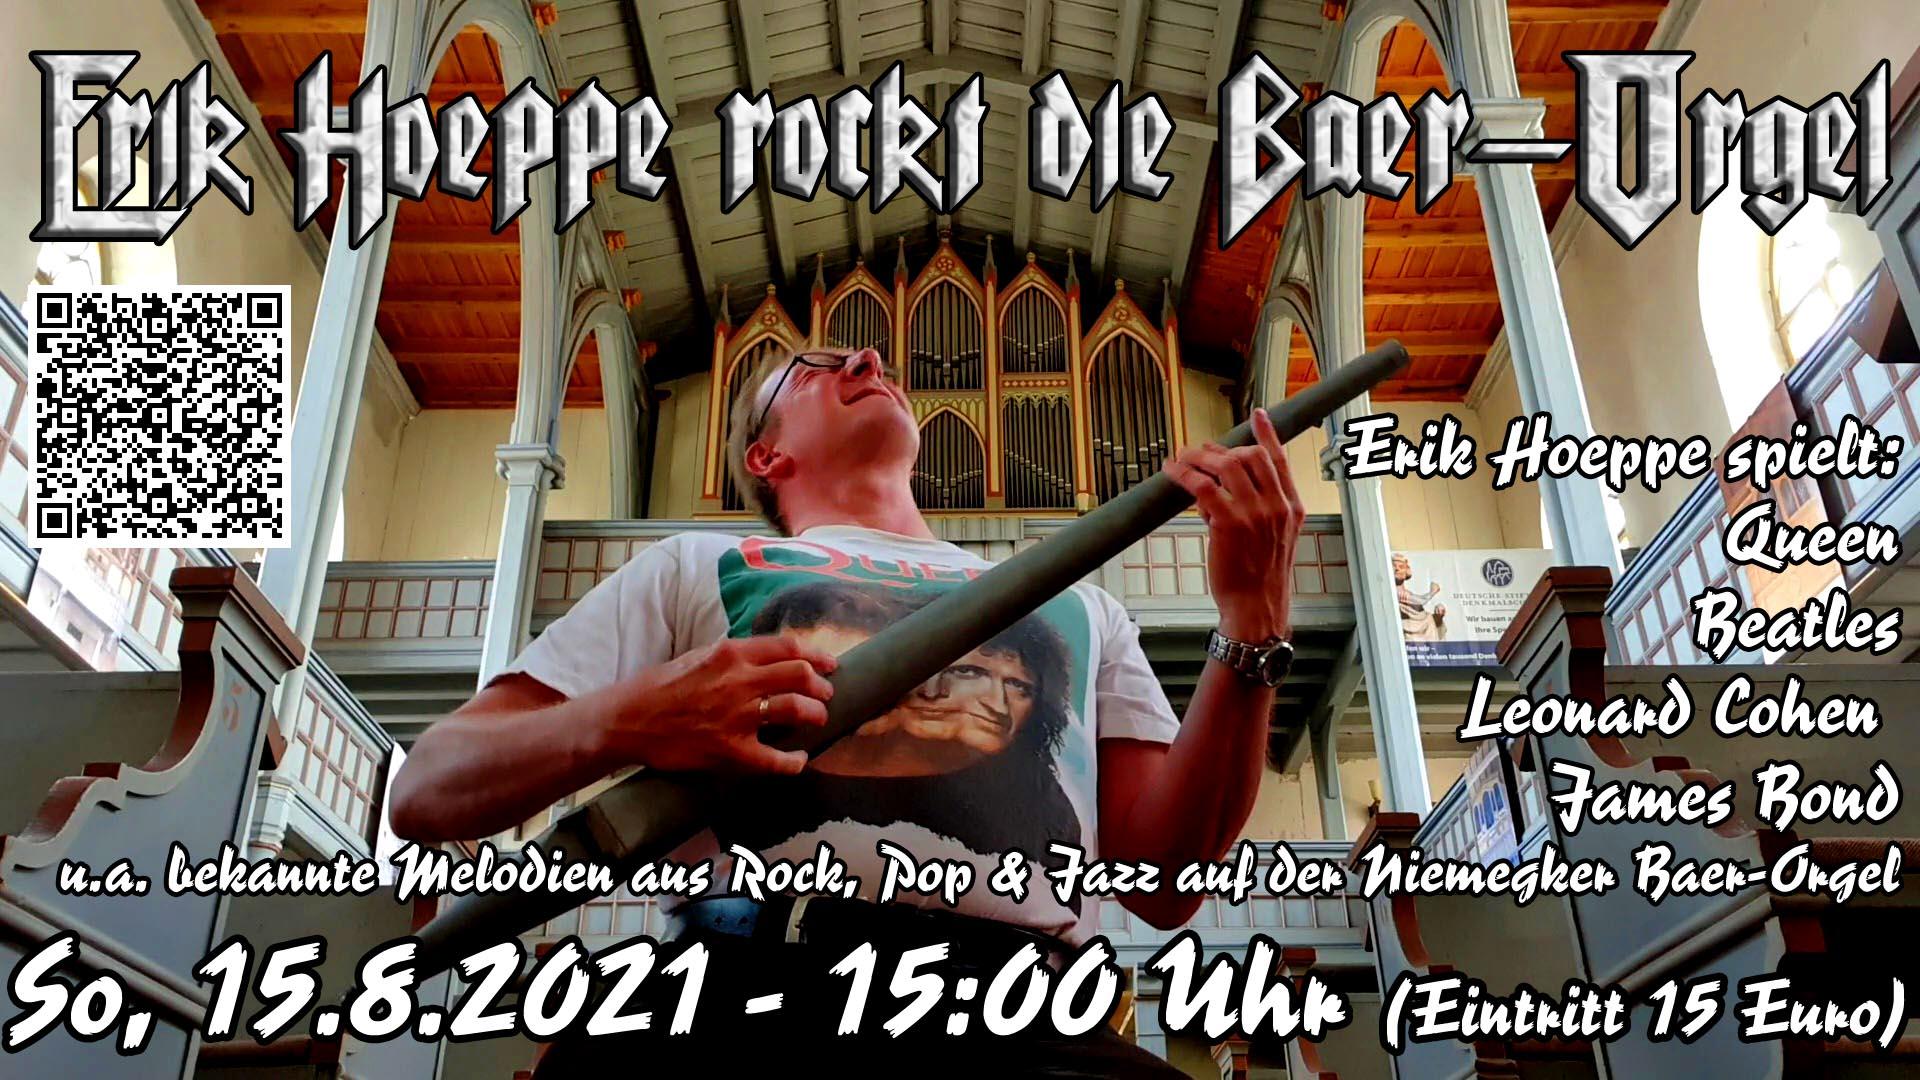 Die Baer-Orgel rockt plakat quer